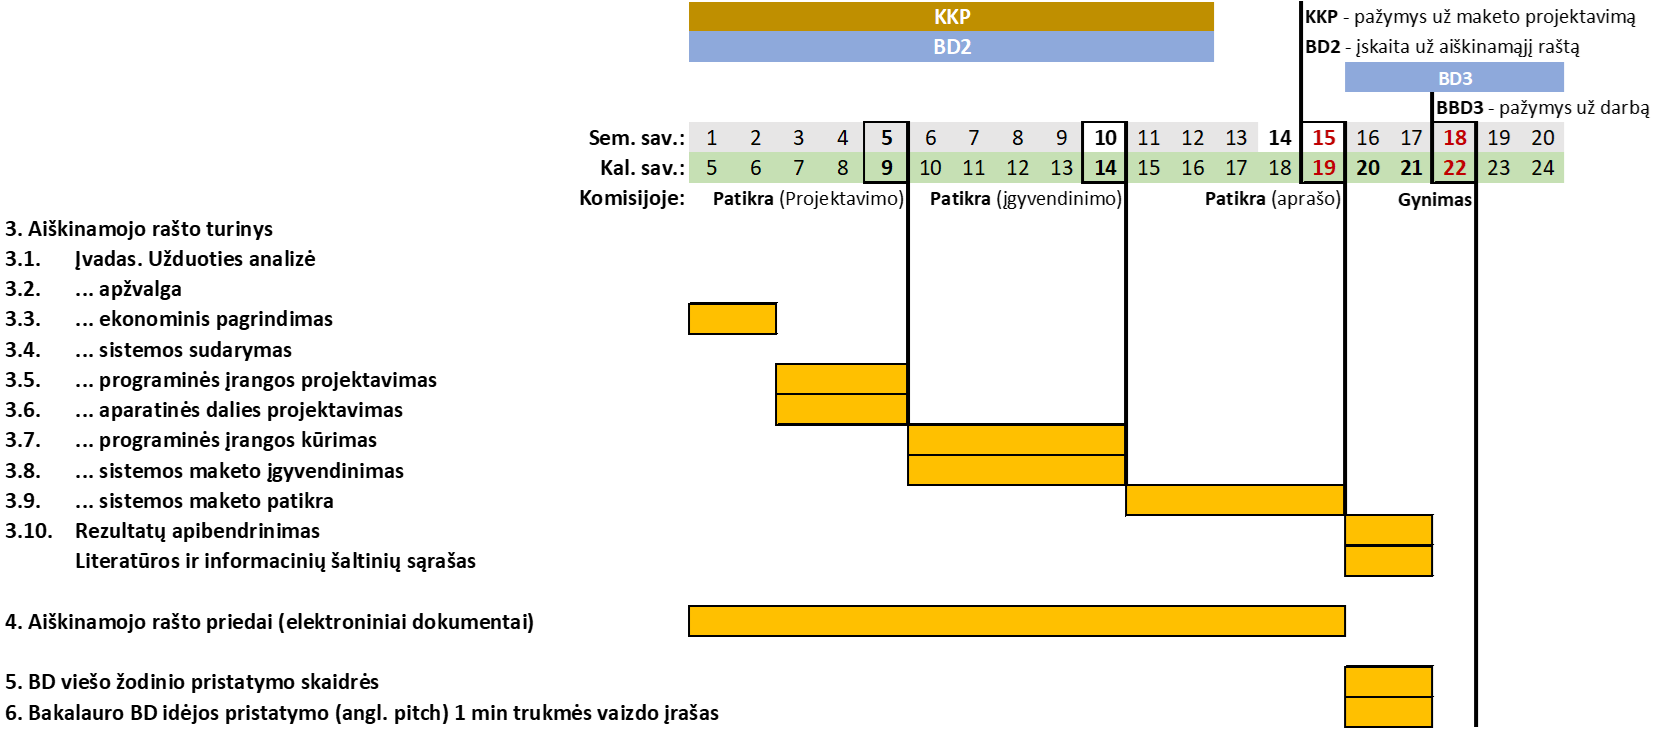 BBD rengimo infografikas